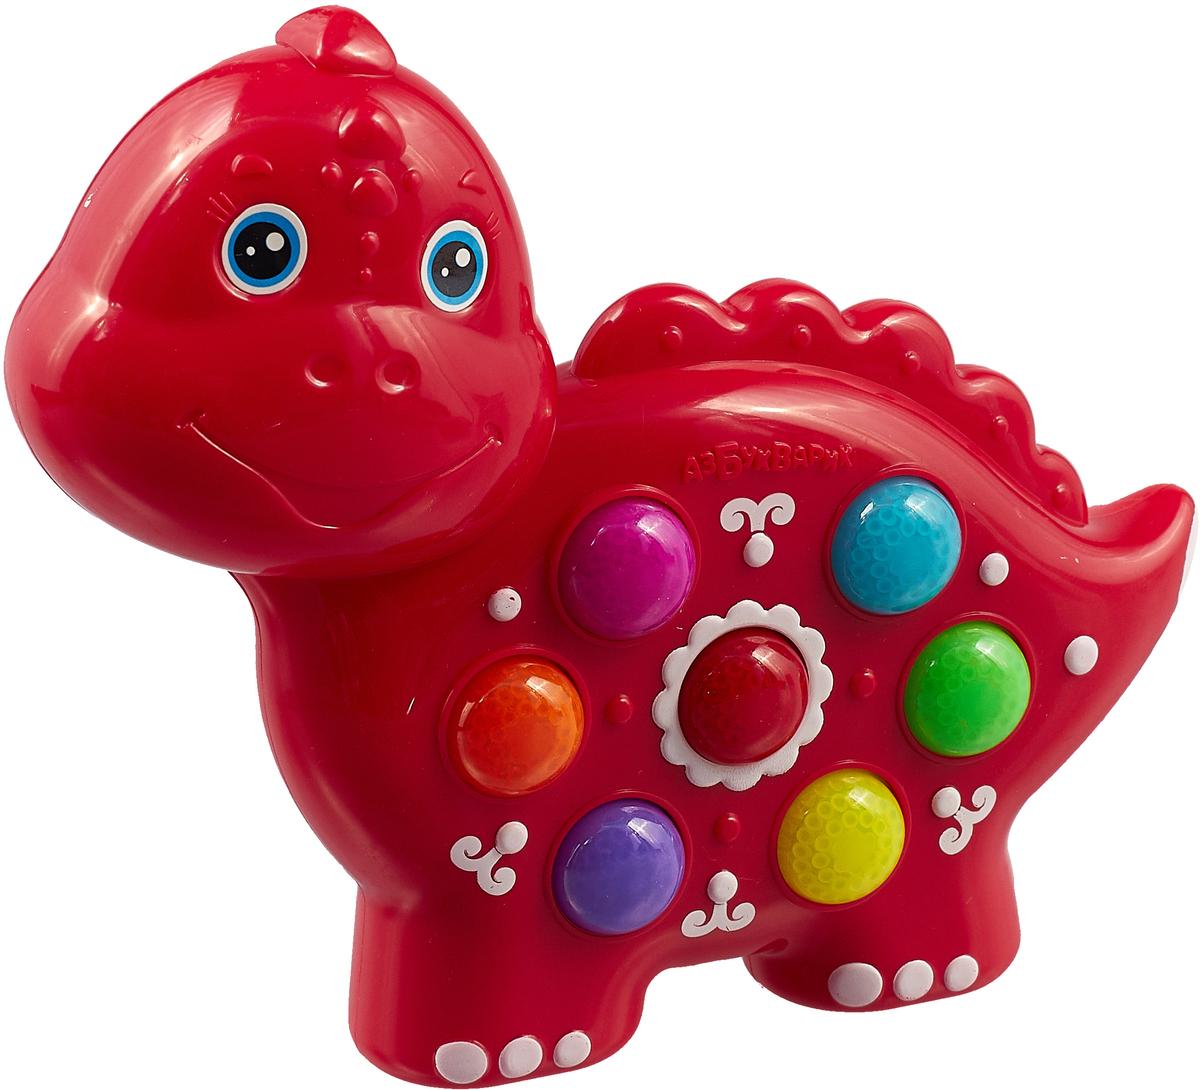 Фото - Музыкальная игрушка Азбукварик Веселушки. Динозаврик чудо часики азбукварик мой динозаврик